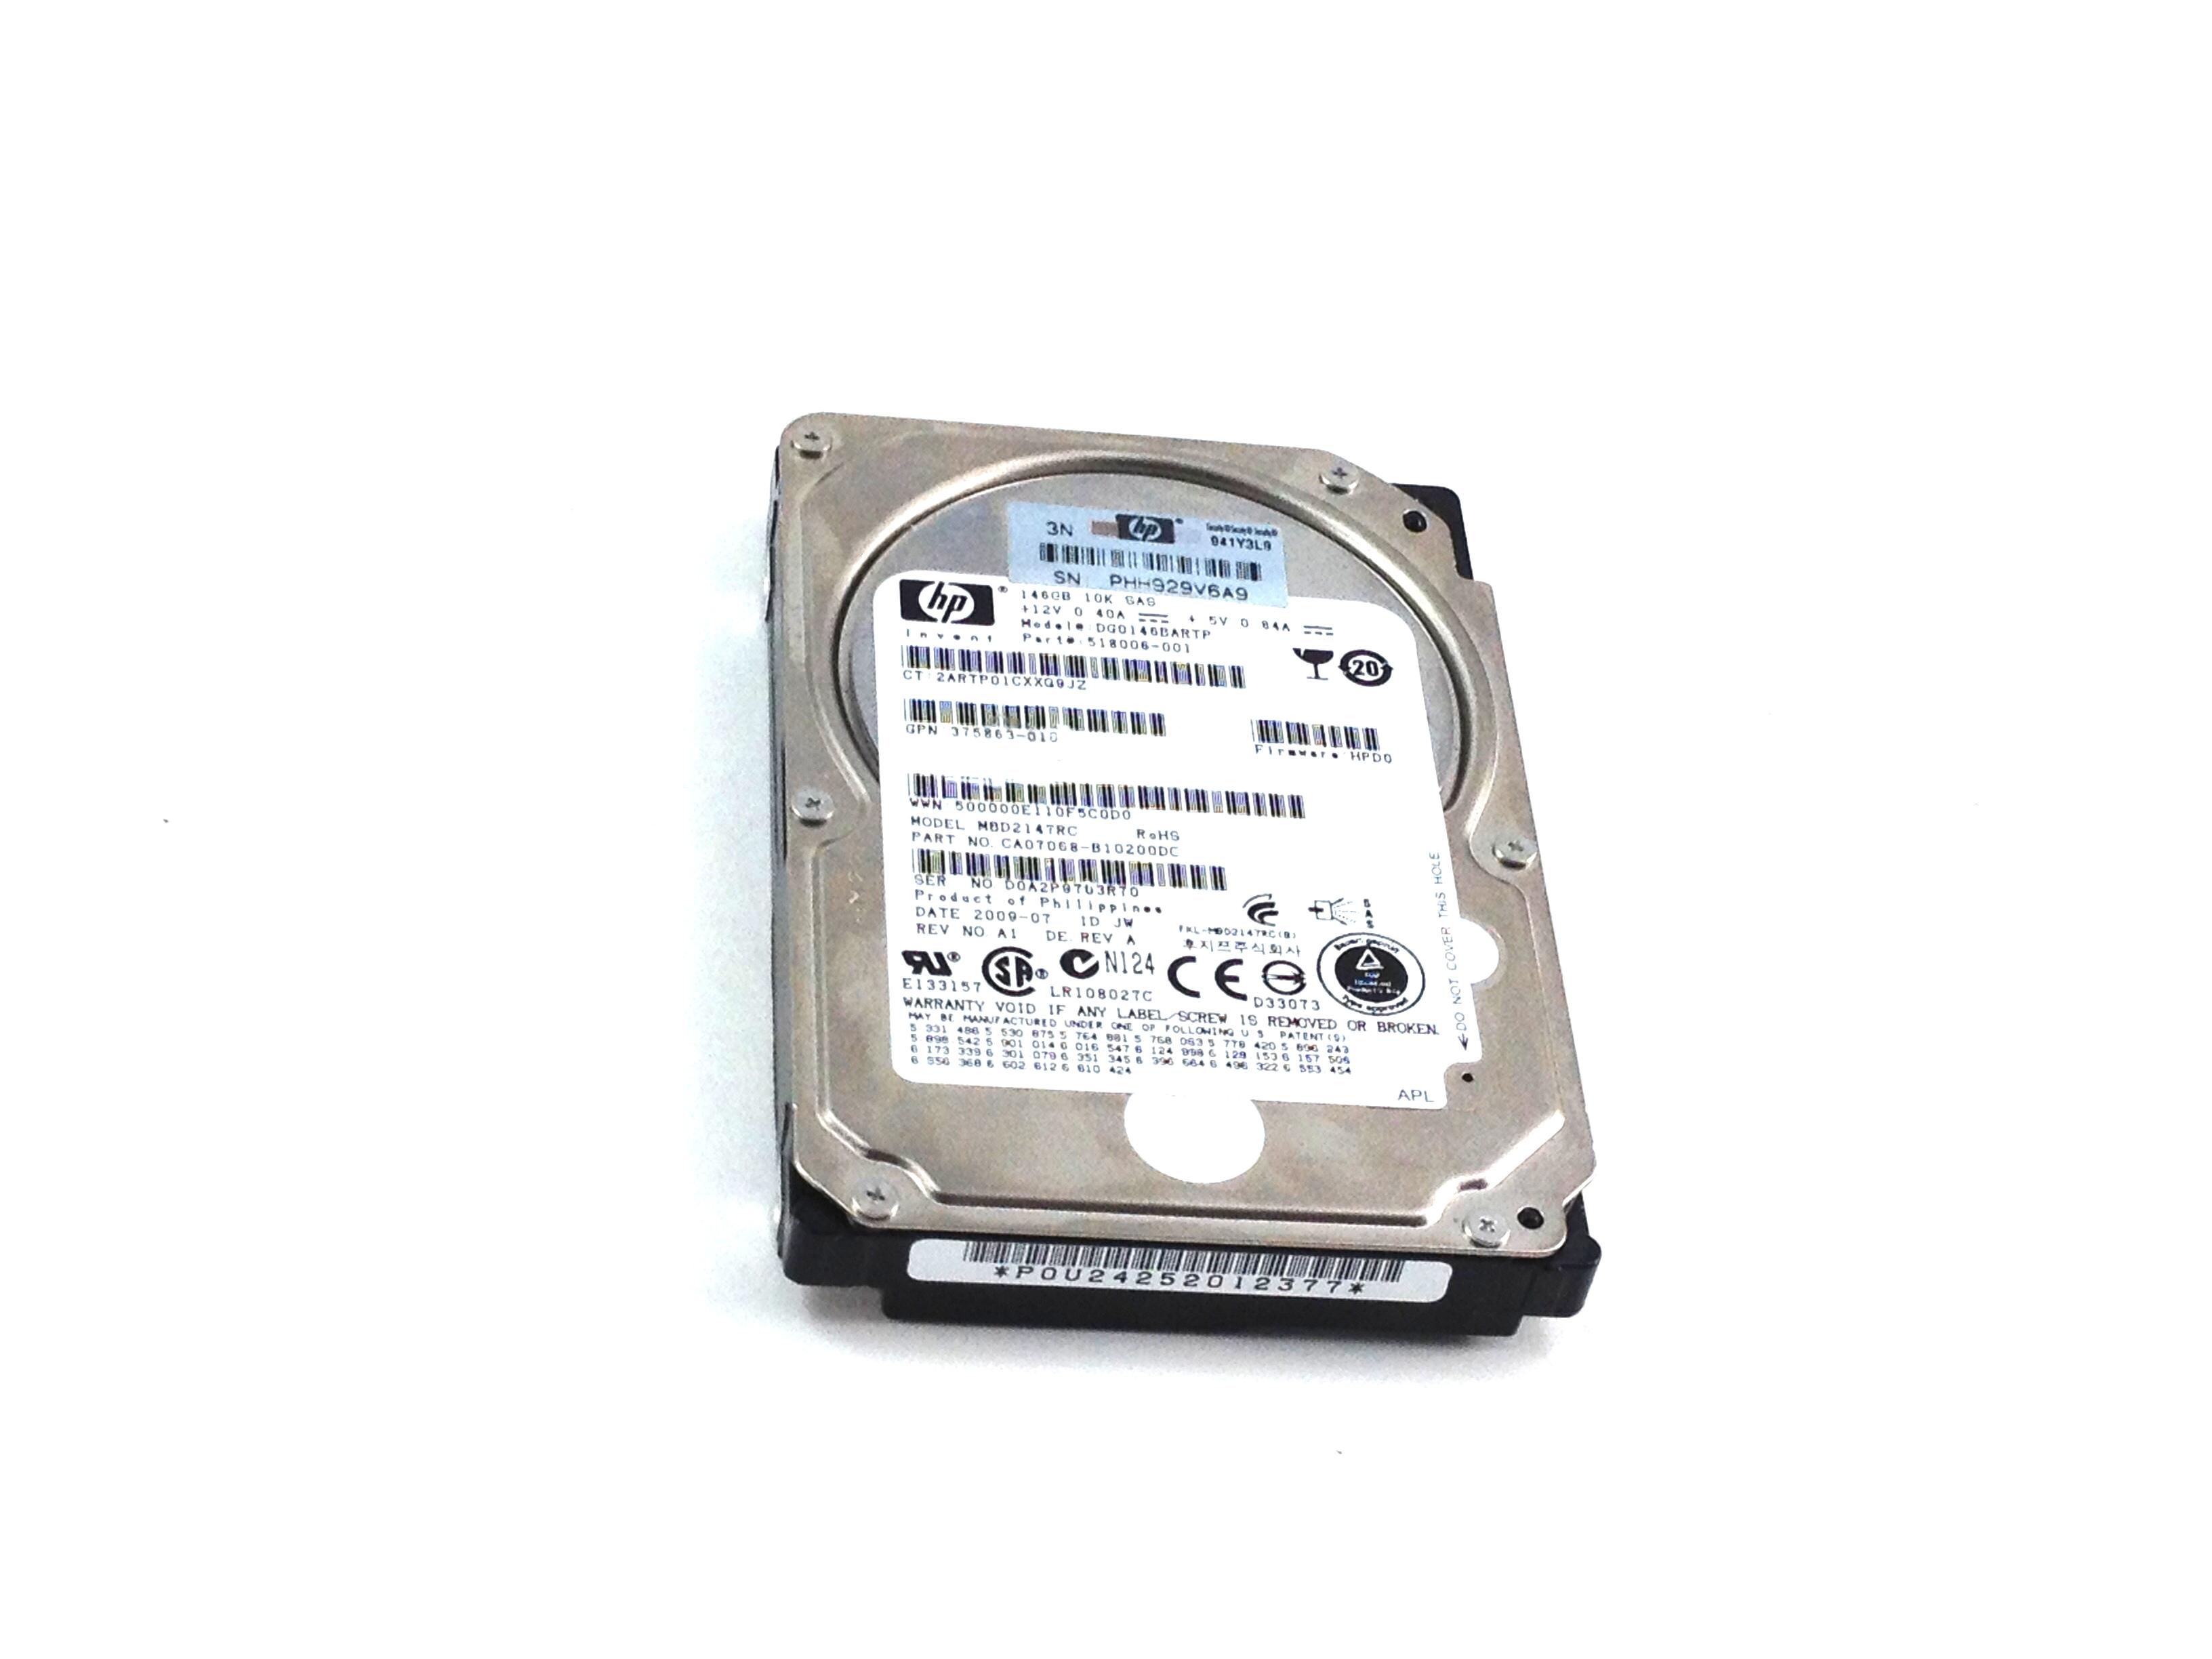 HP 146GB 10K SAS 2.5'' 2 Port Hard Drive (518006-001)